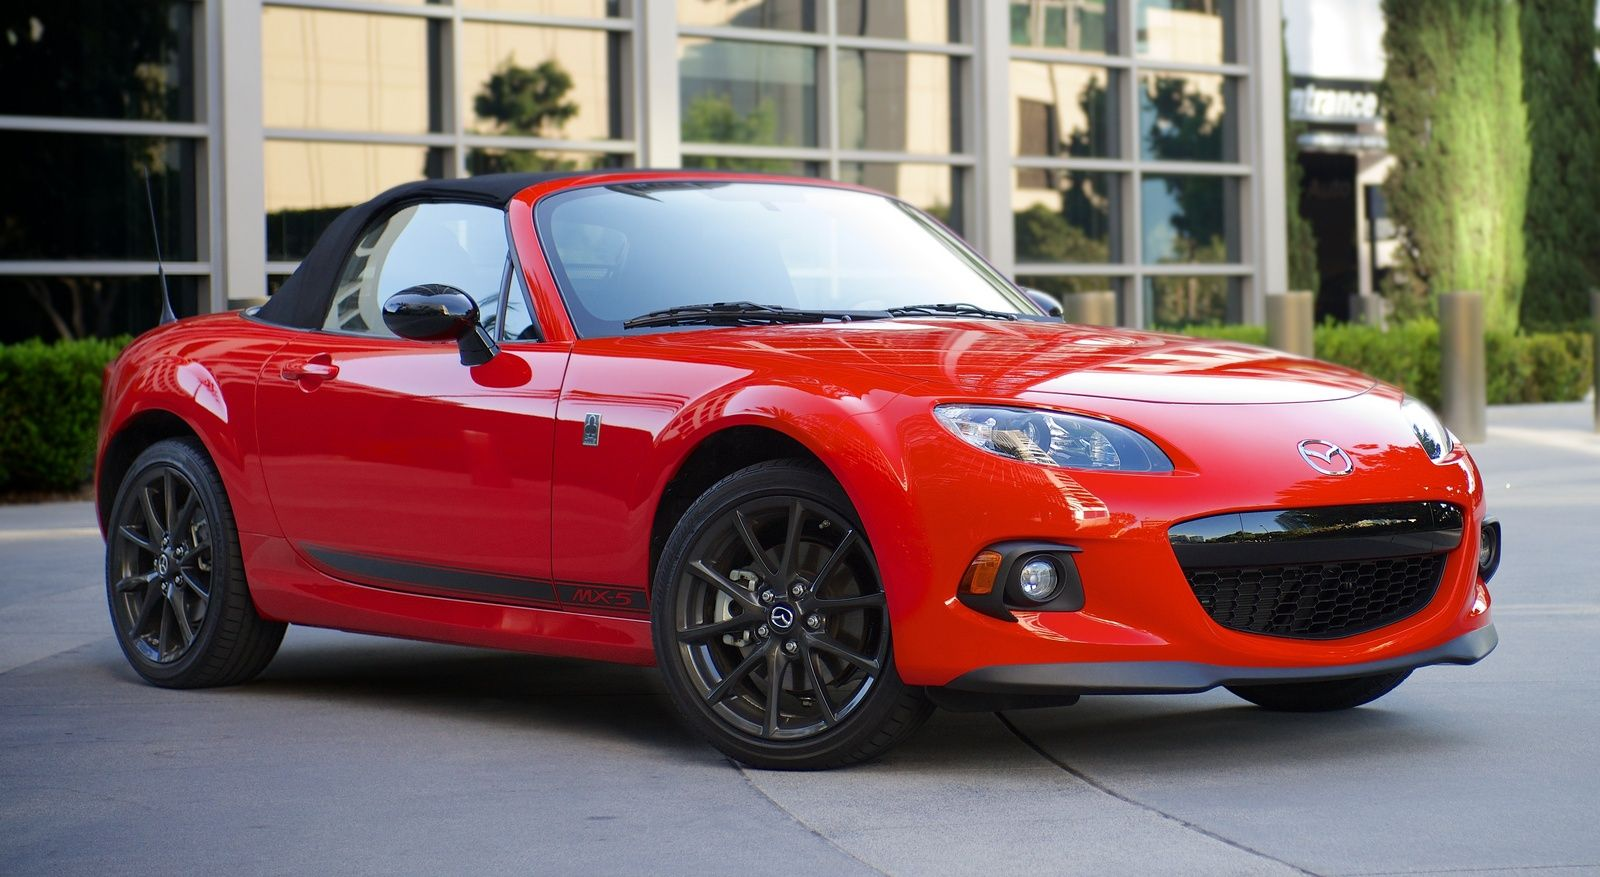 2014 club Mazda, Cool sports cars, Mazda miata